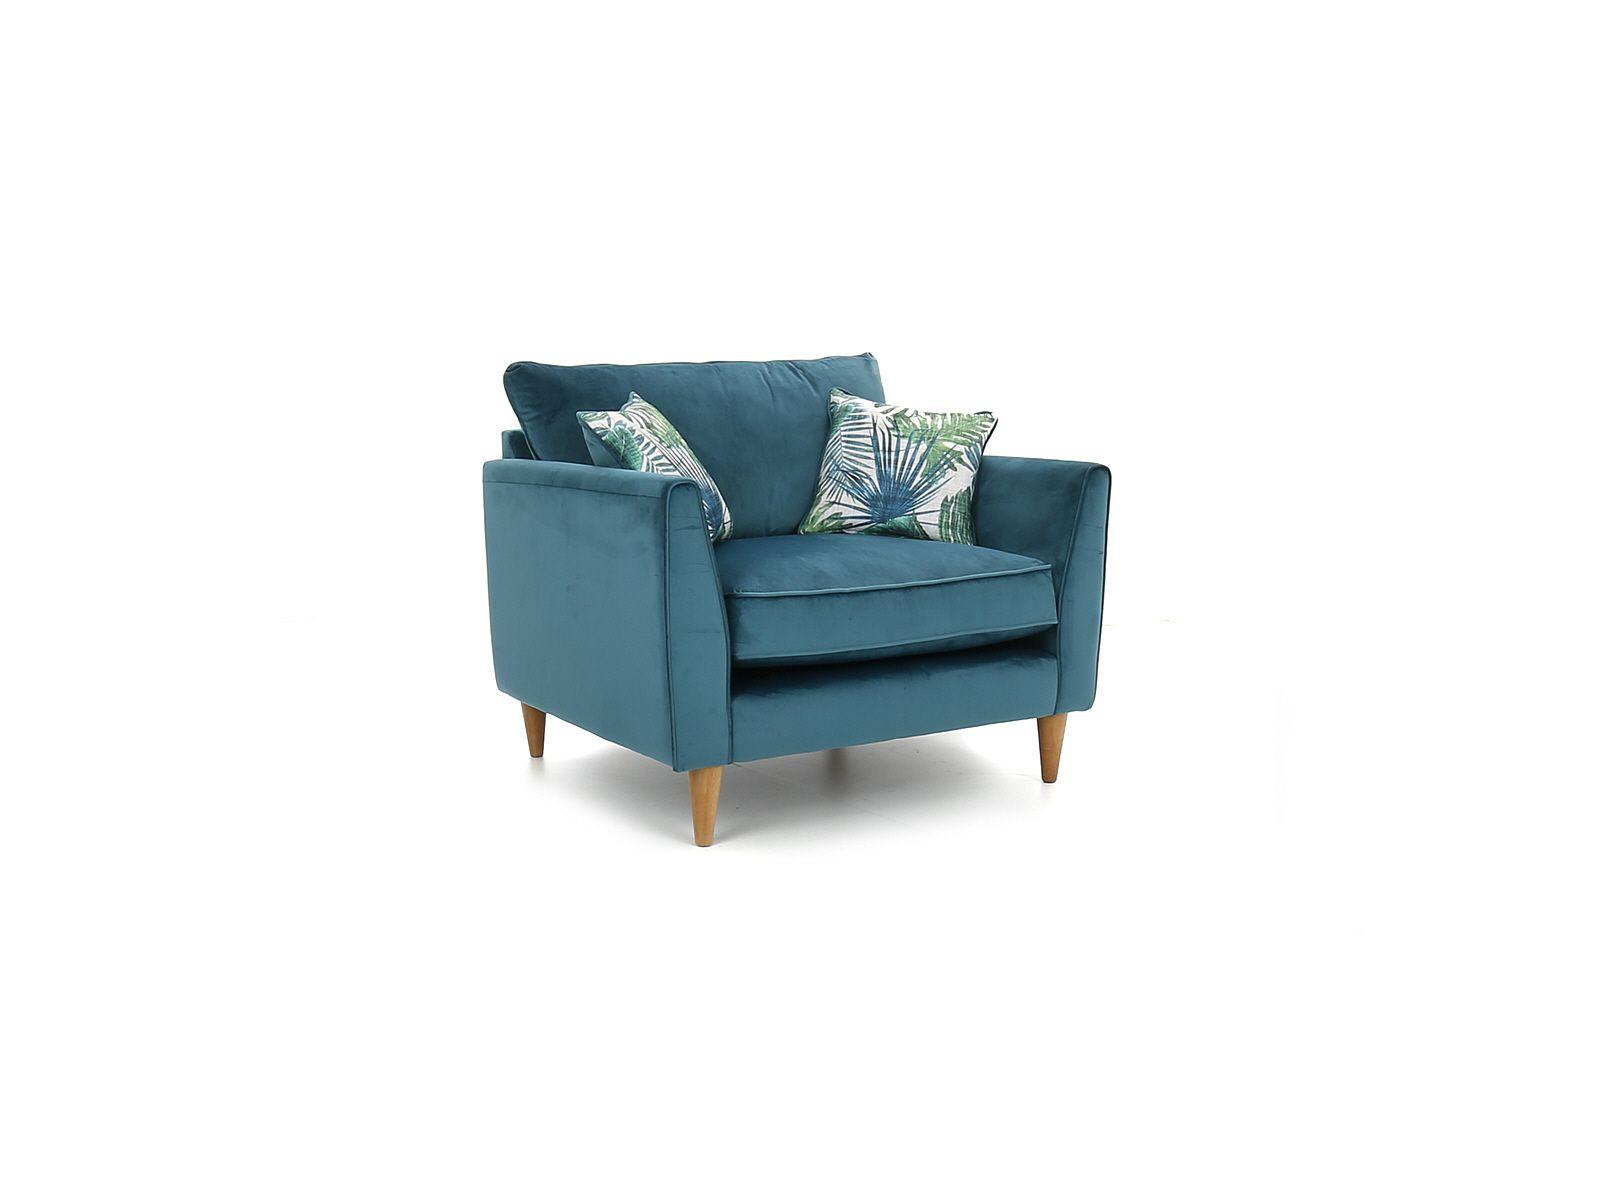 Lola Snuggler sofa